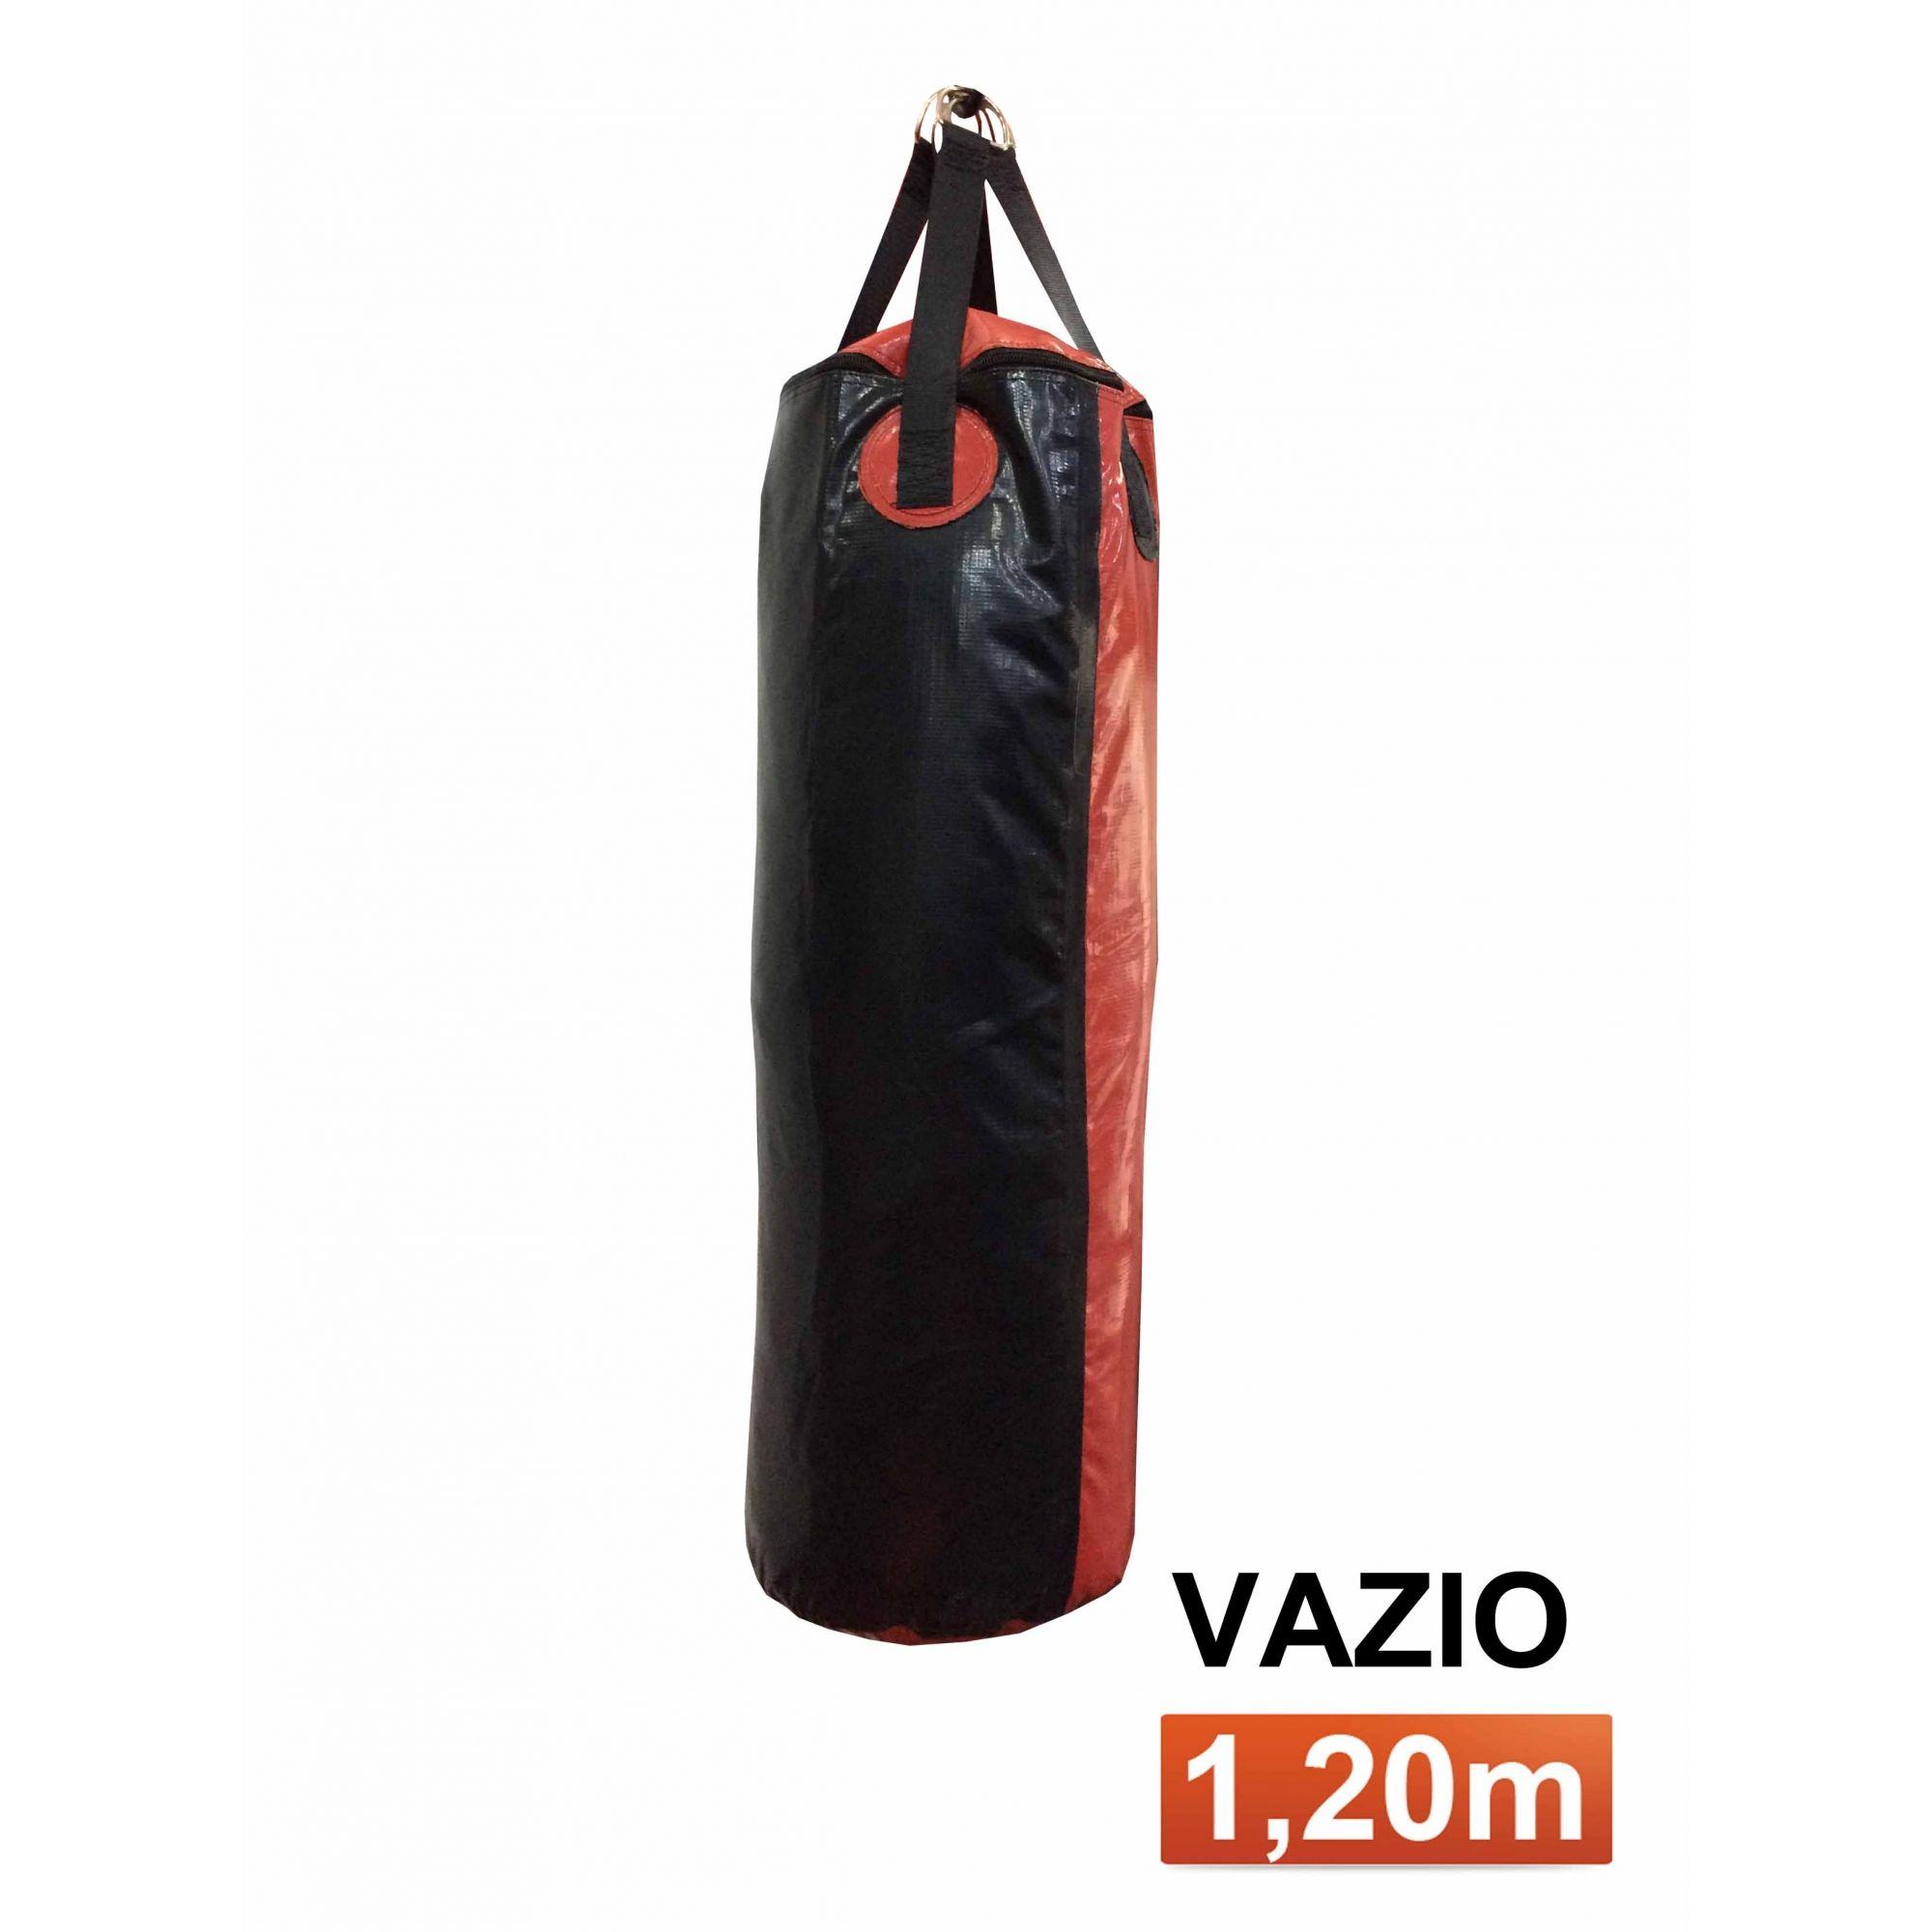 Saco de Pancadas - Lona Náutica - Vazio - 1,20m- Toriuk